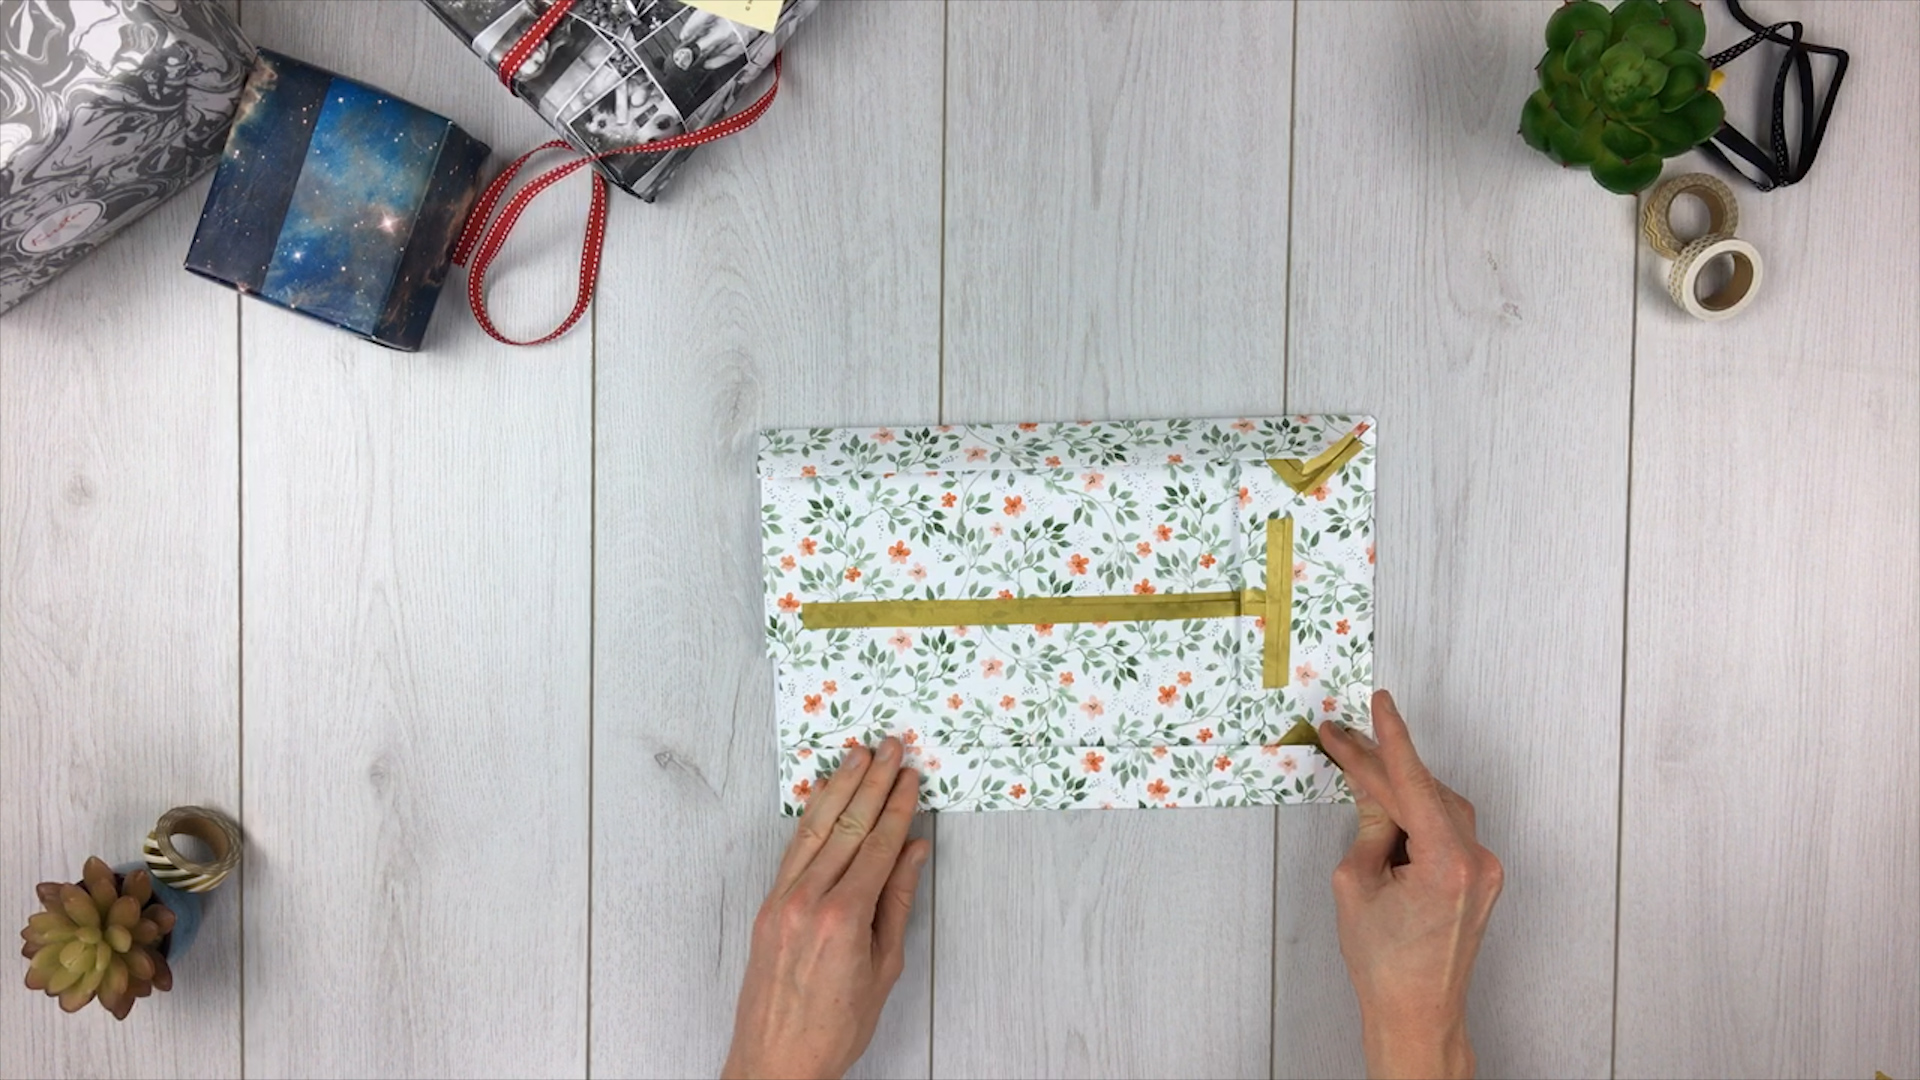 Geschenktüte basteln - Schritt 7